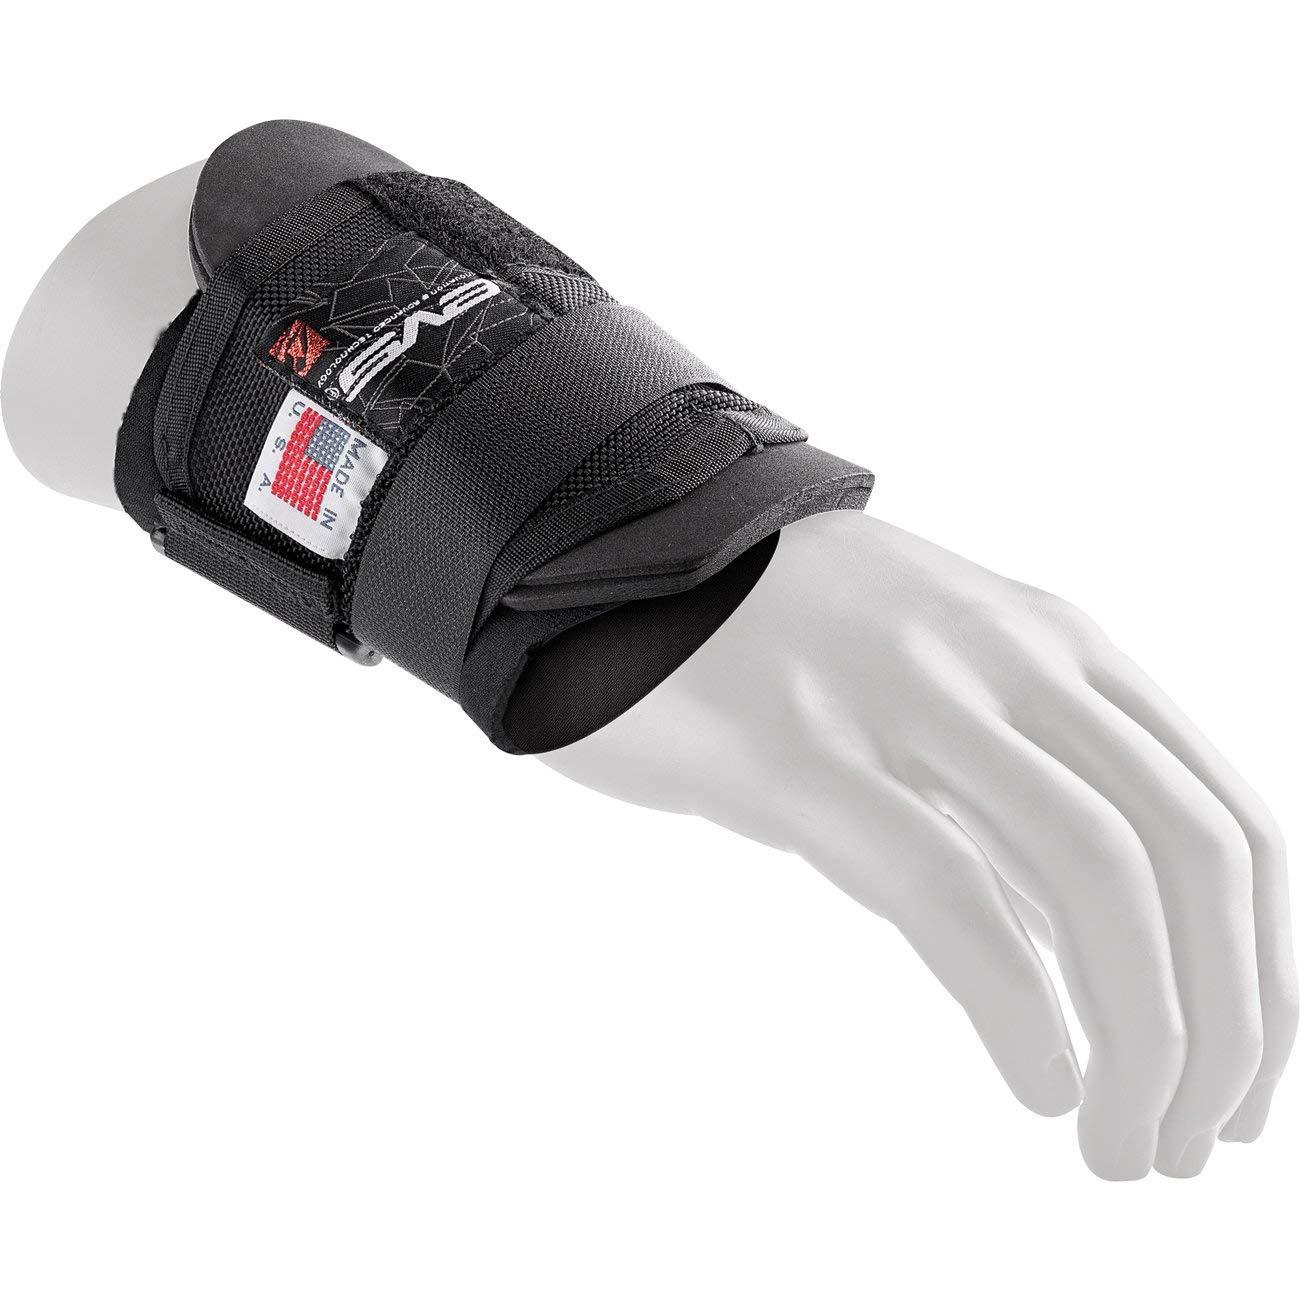 EVS Sports WB01 Wrist Brace (Adult) by EVS Sports